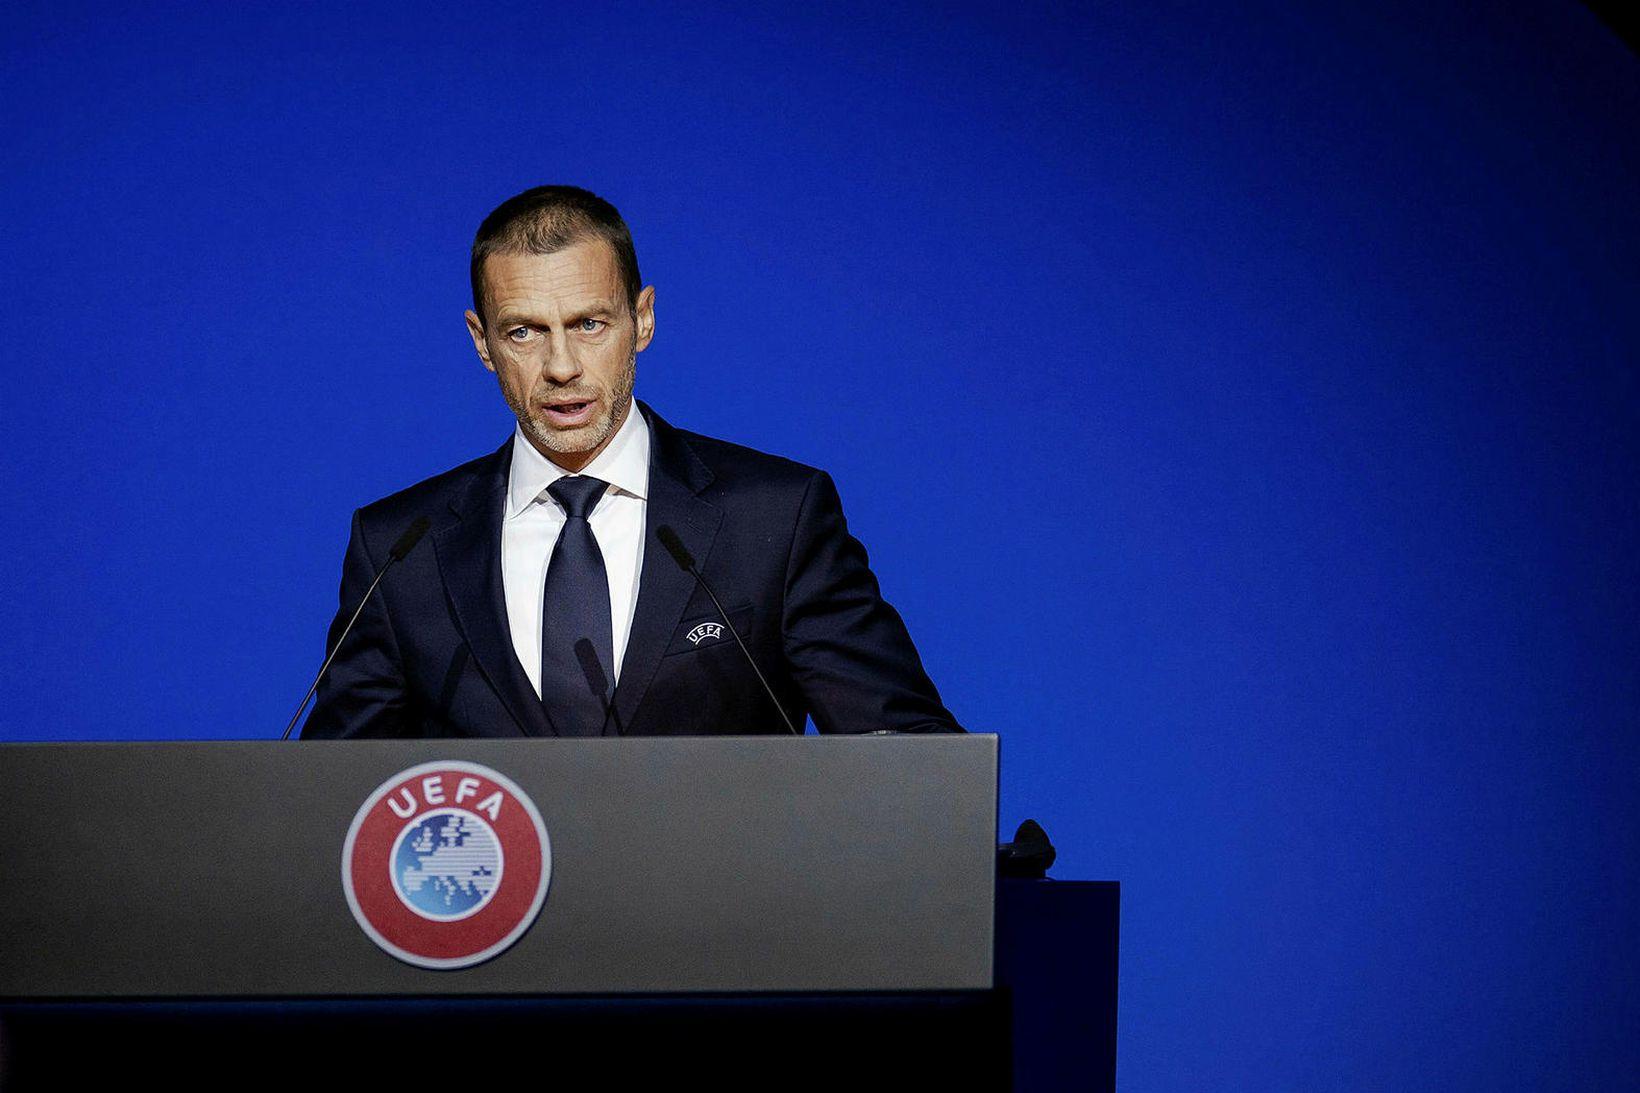 Aleksander Ceferin forseti UEFA og hans fólk hefur sent frá …